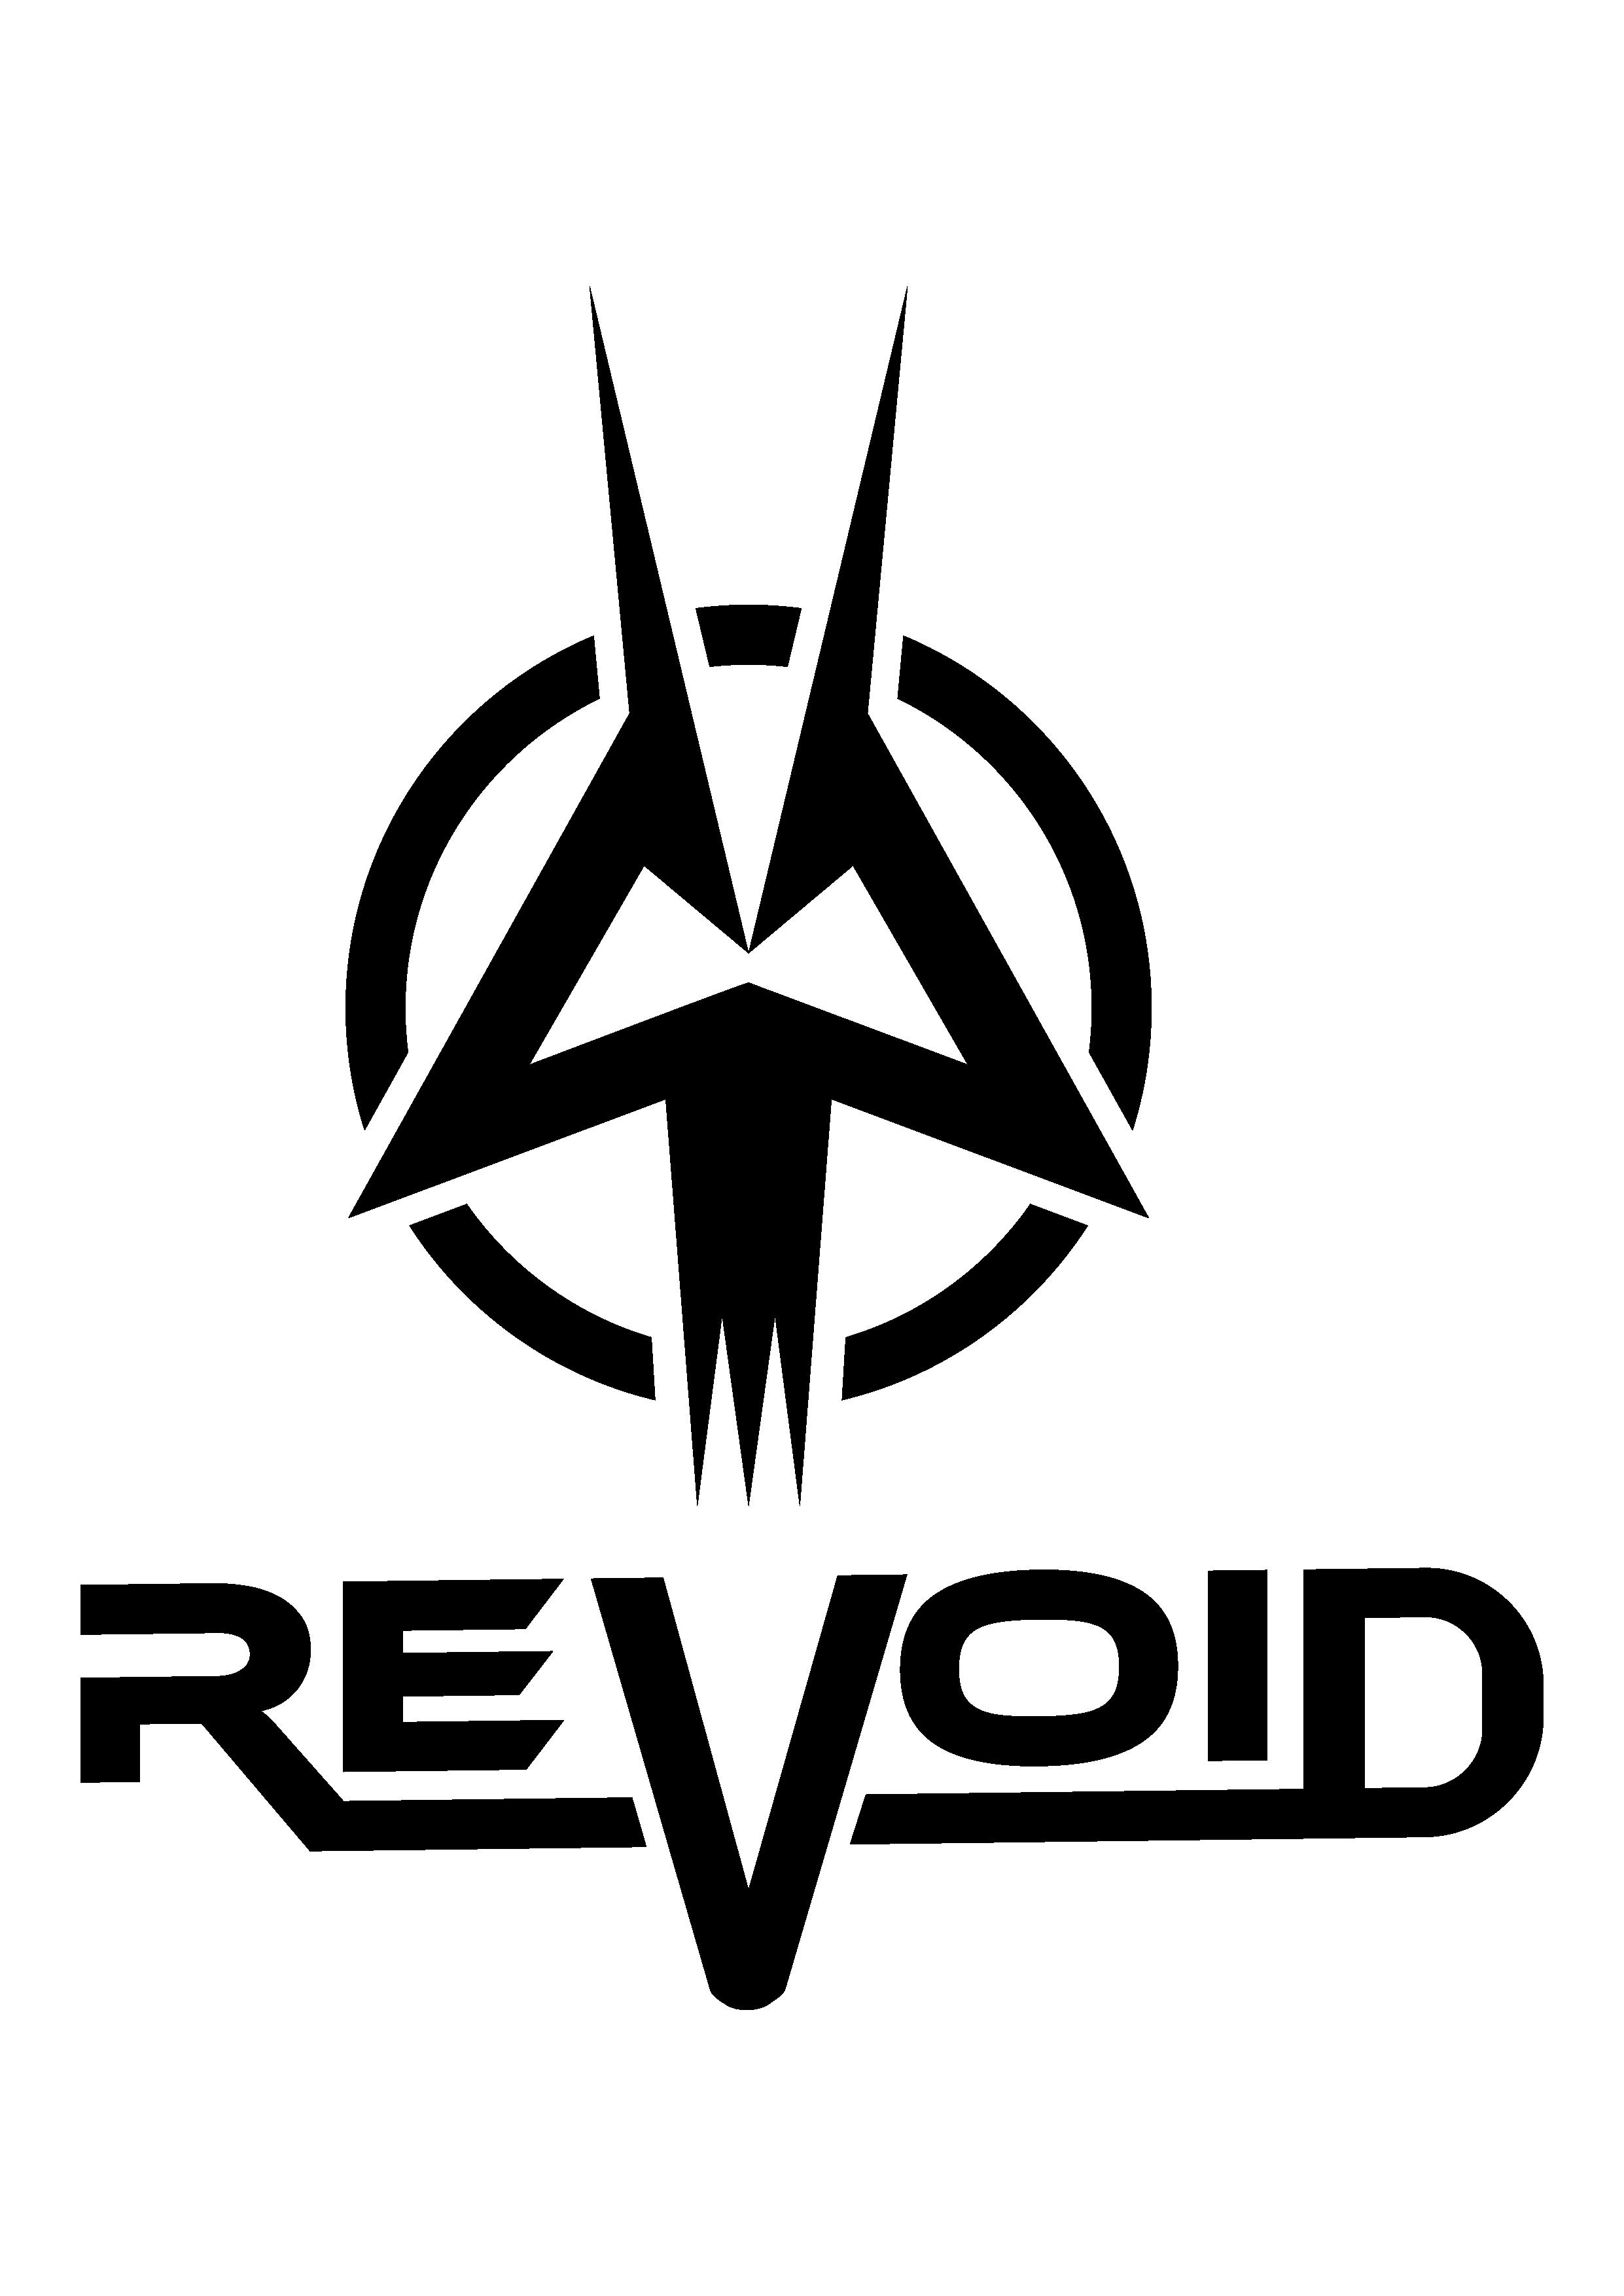 Band name logo